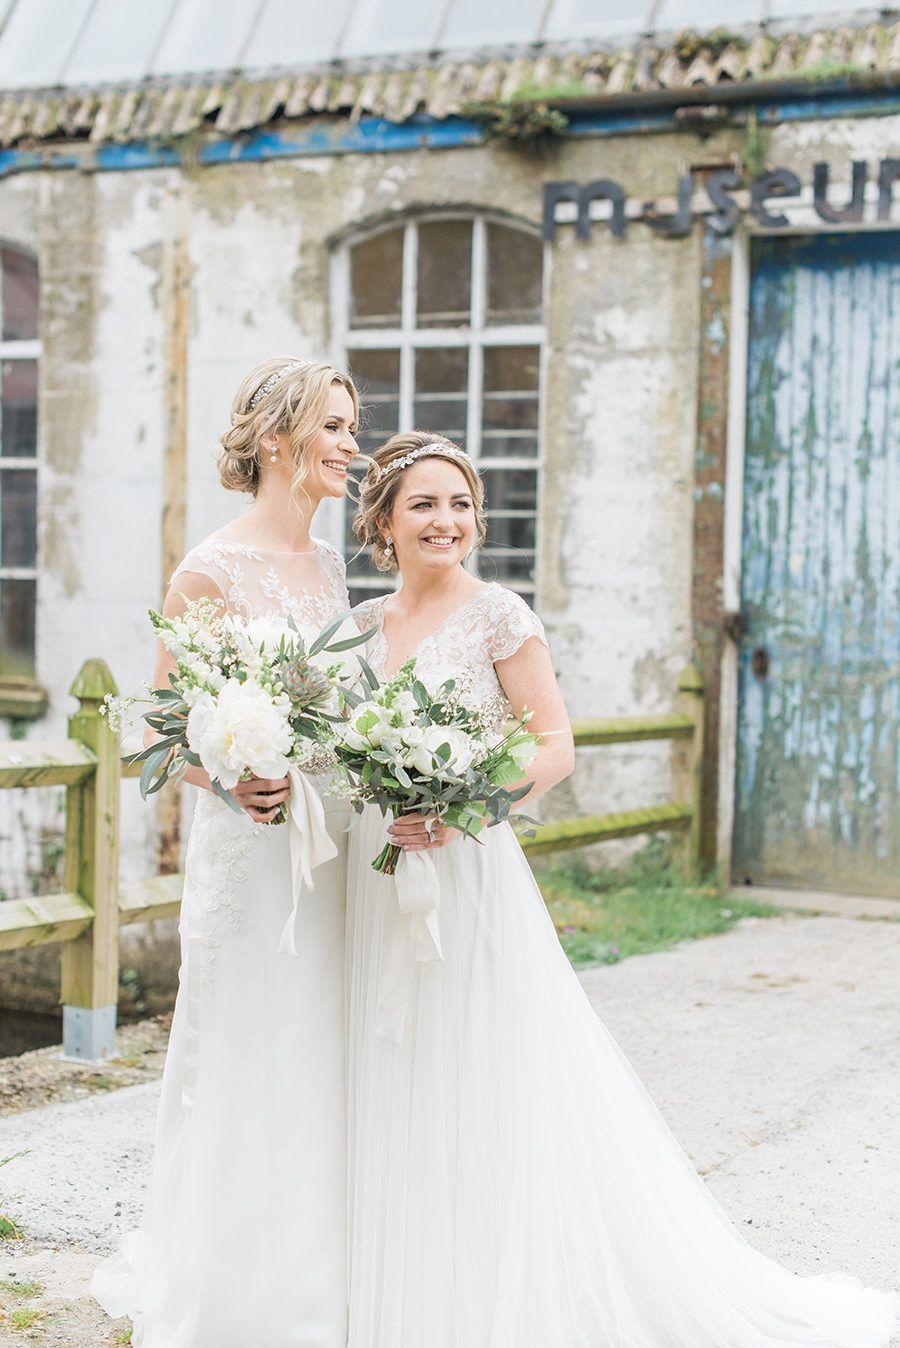 The Sweetest Wedding At The 18th Century Millhouse In Ireland Bridal Beauty Wedding Lesbian Wedding [ 1348 x 900 Pixel ]